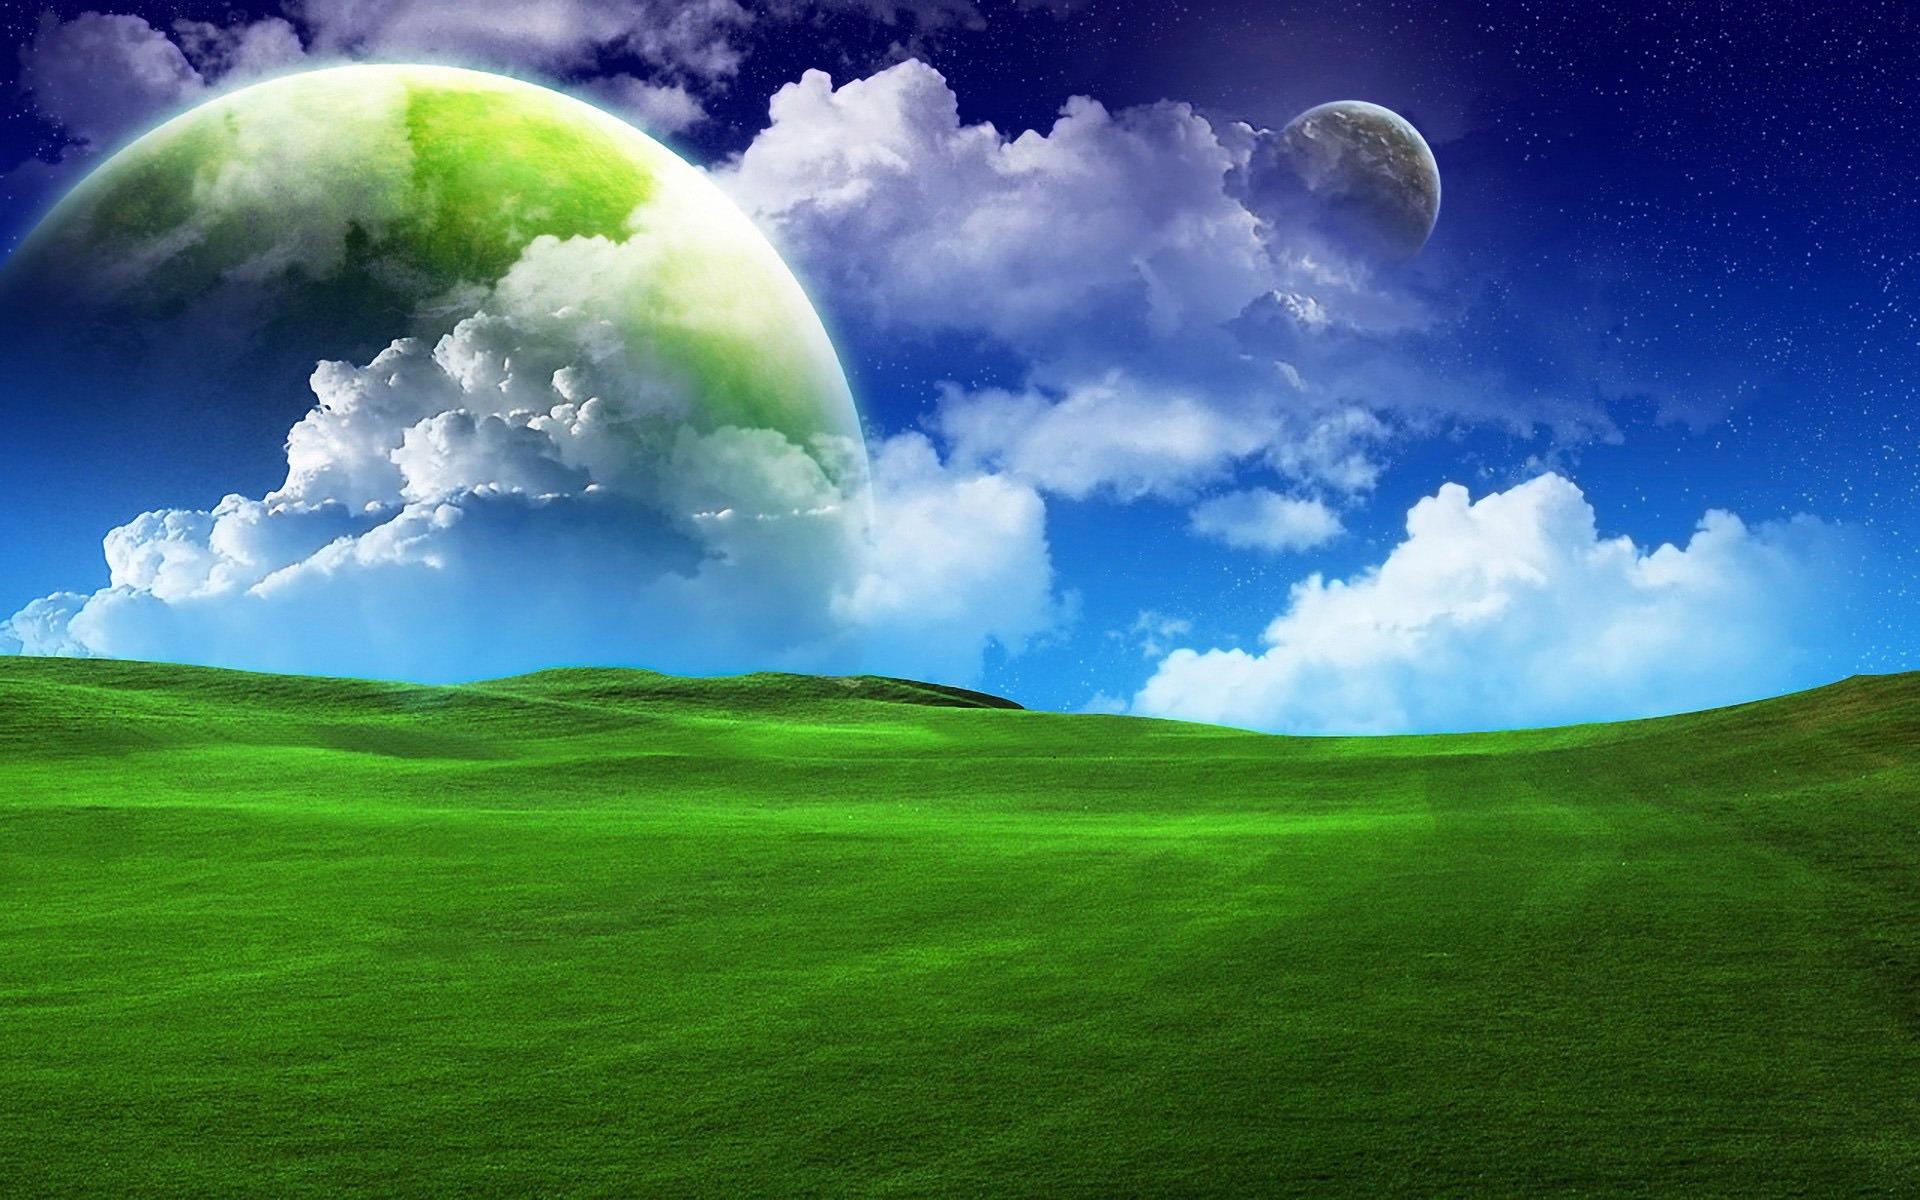 Utorrent free download for windows 10 desktop windows 7